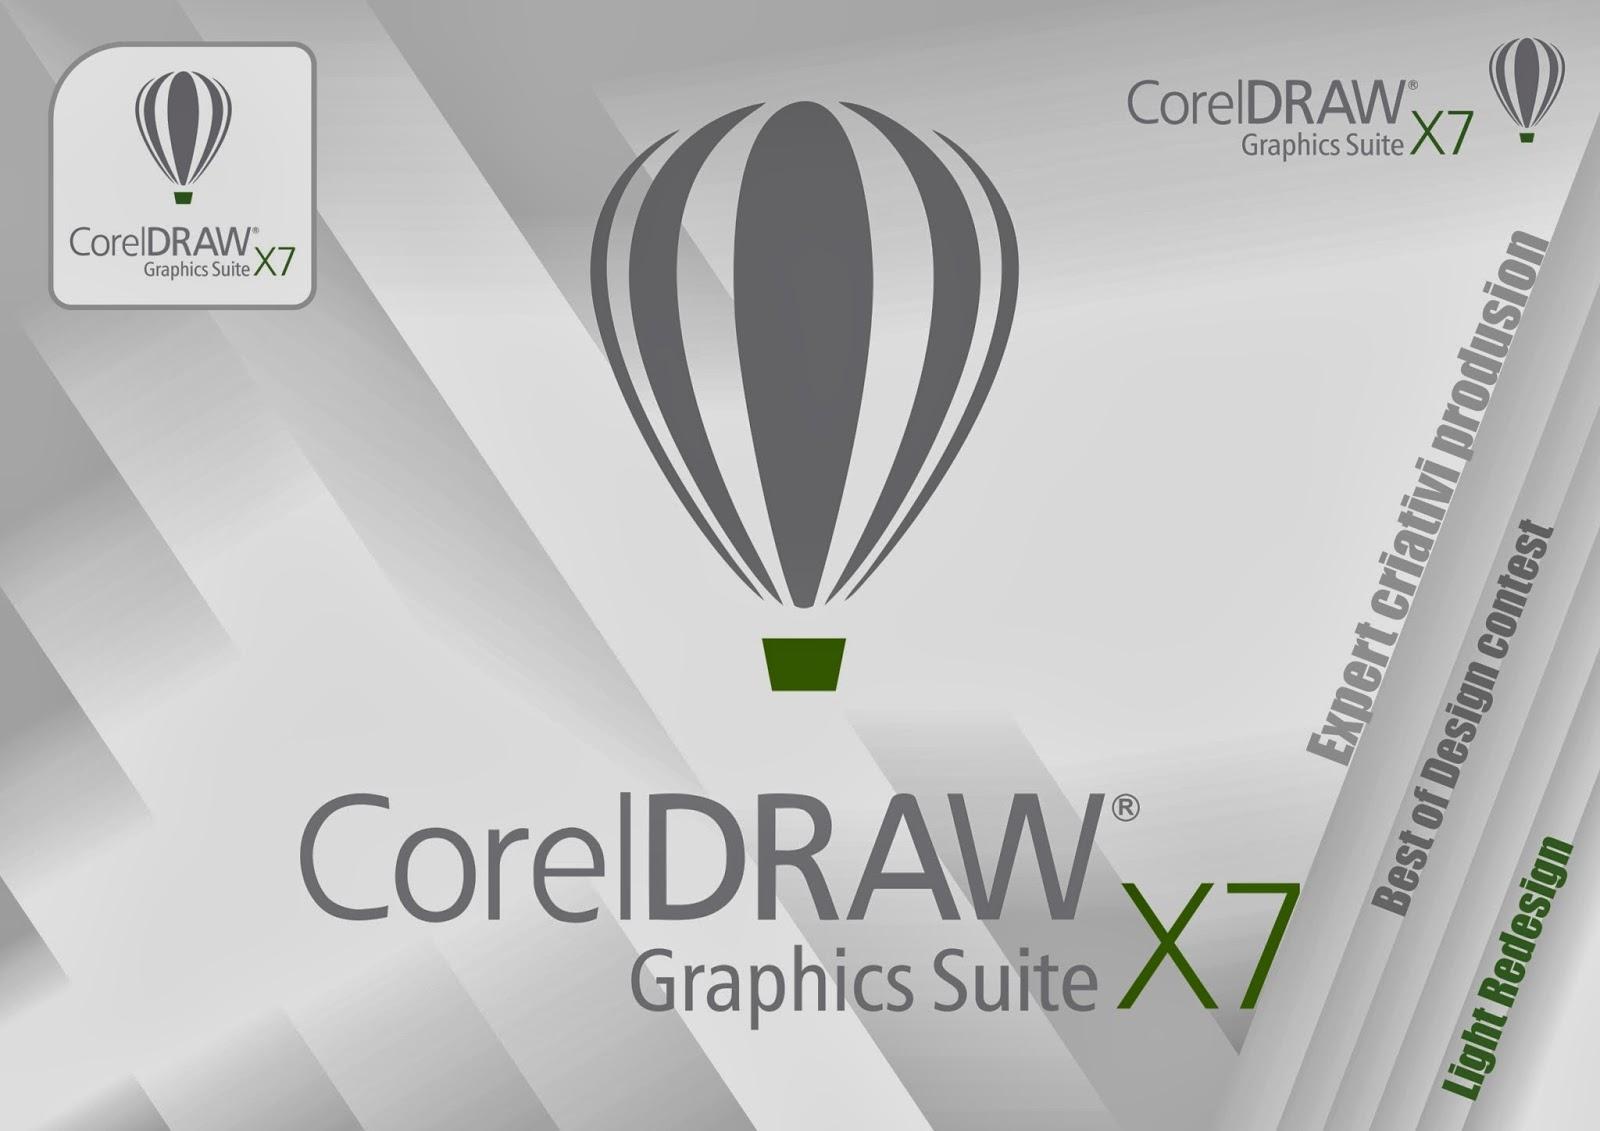 crack coreldraw graphics suite x7